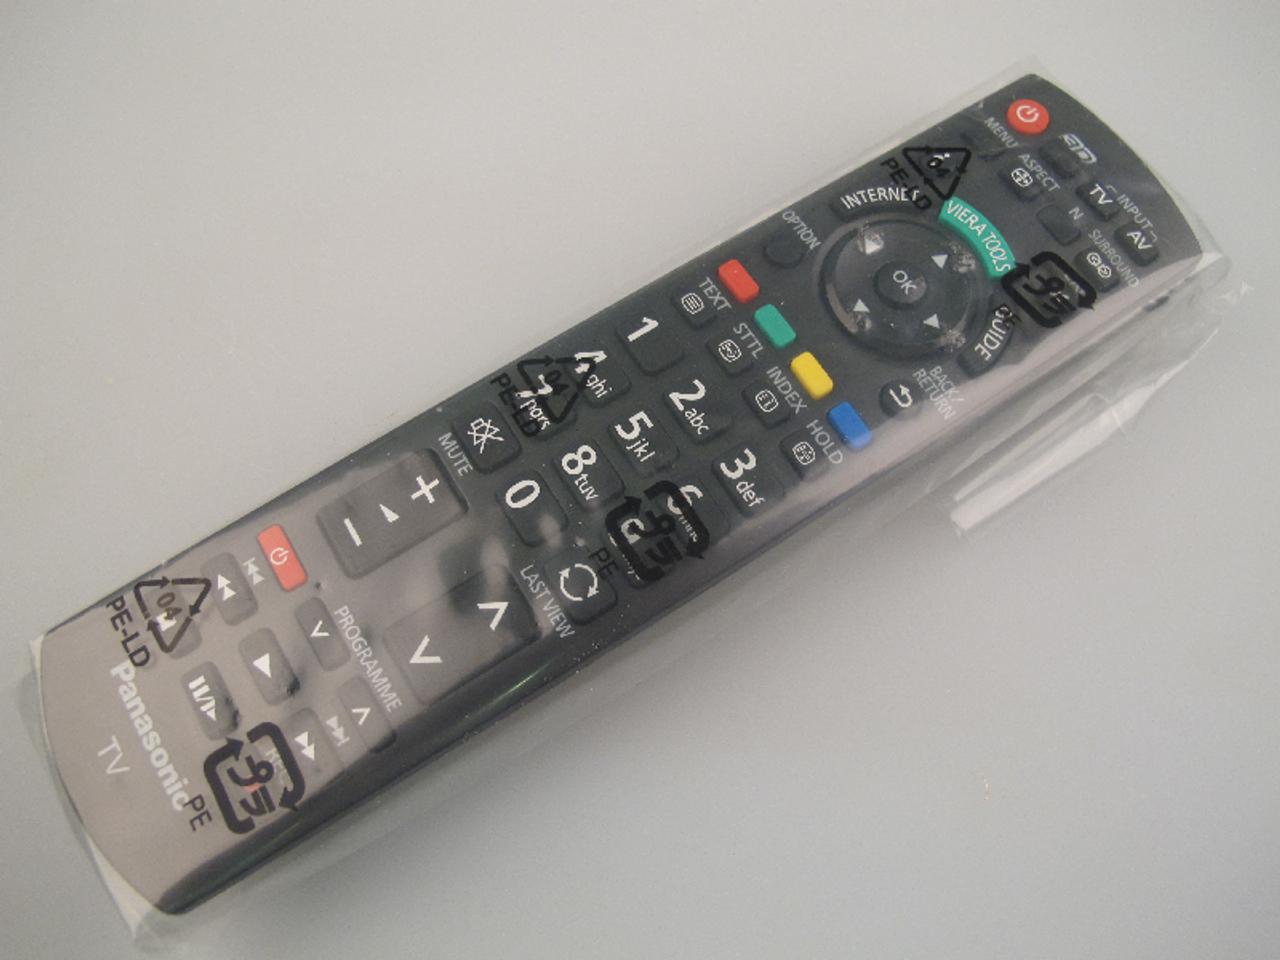 Panasonic Viera TX-L32ETX54 TV Windows 7